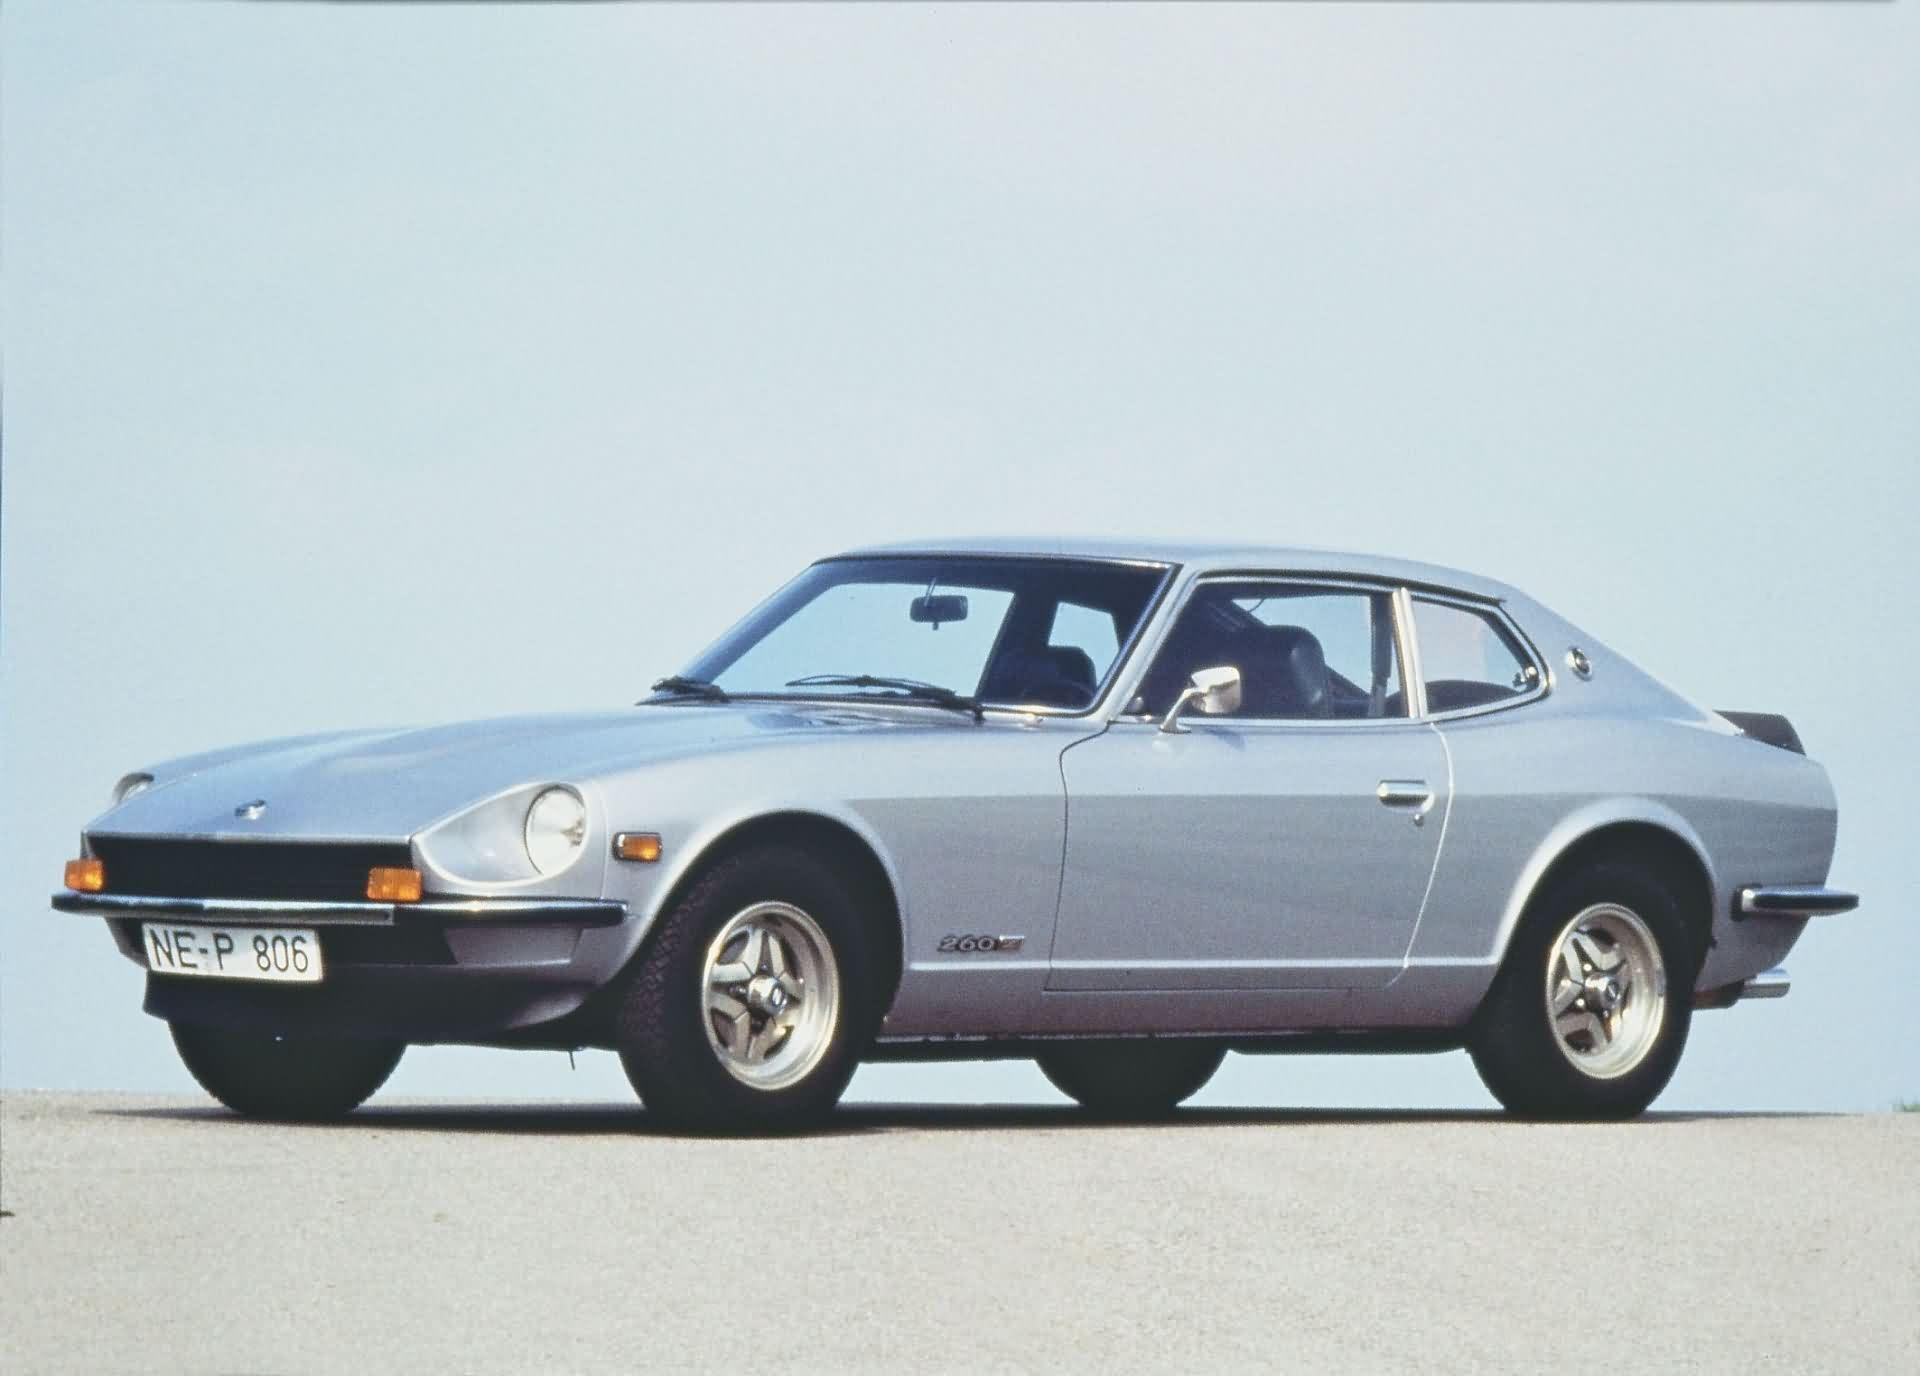 Datsun 280ZX (1979)